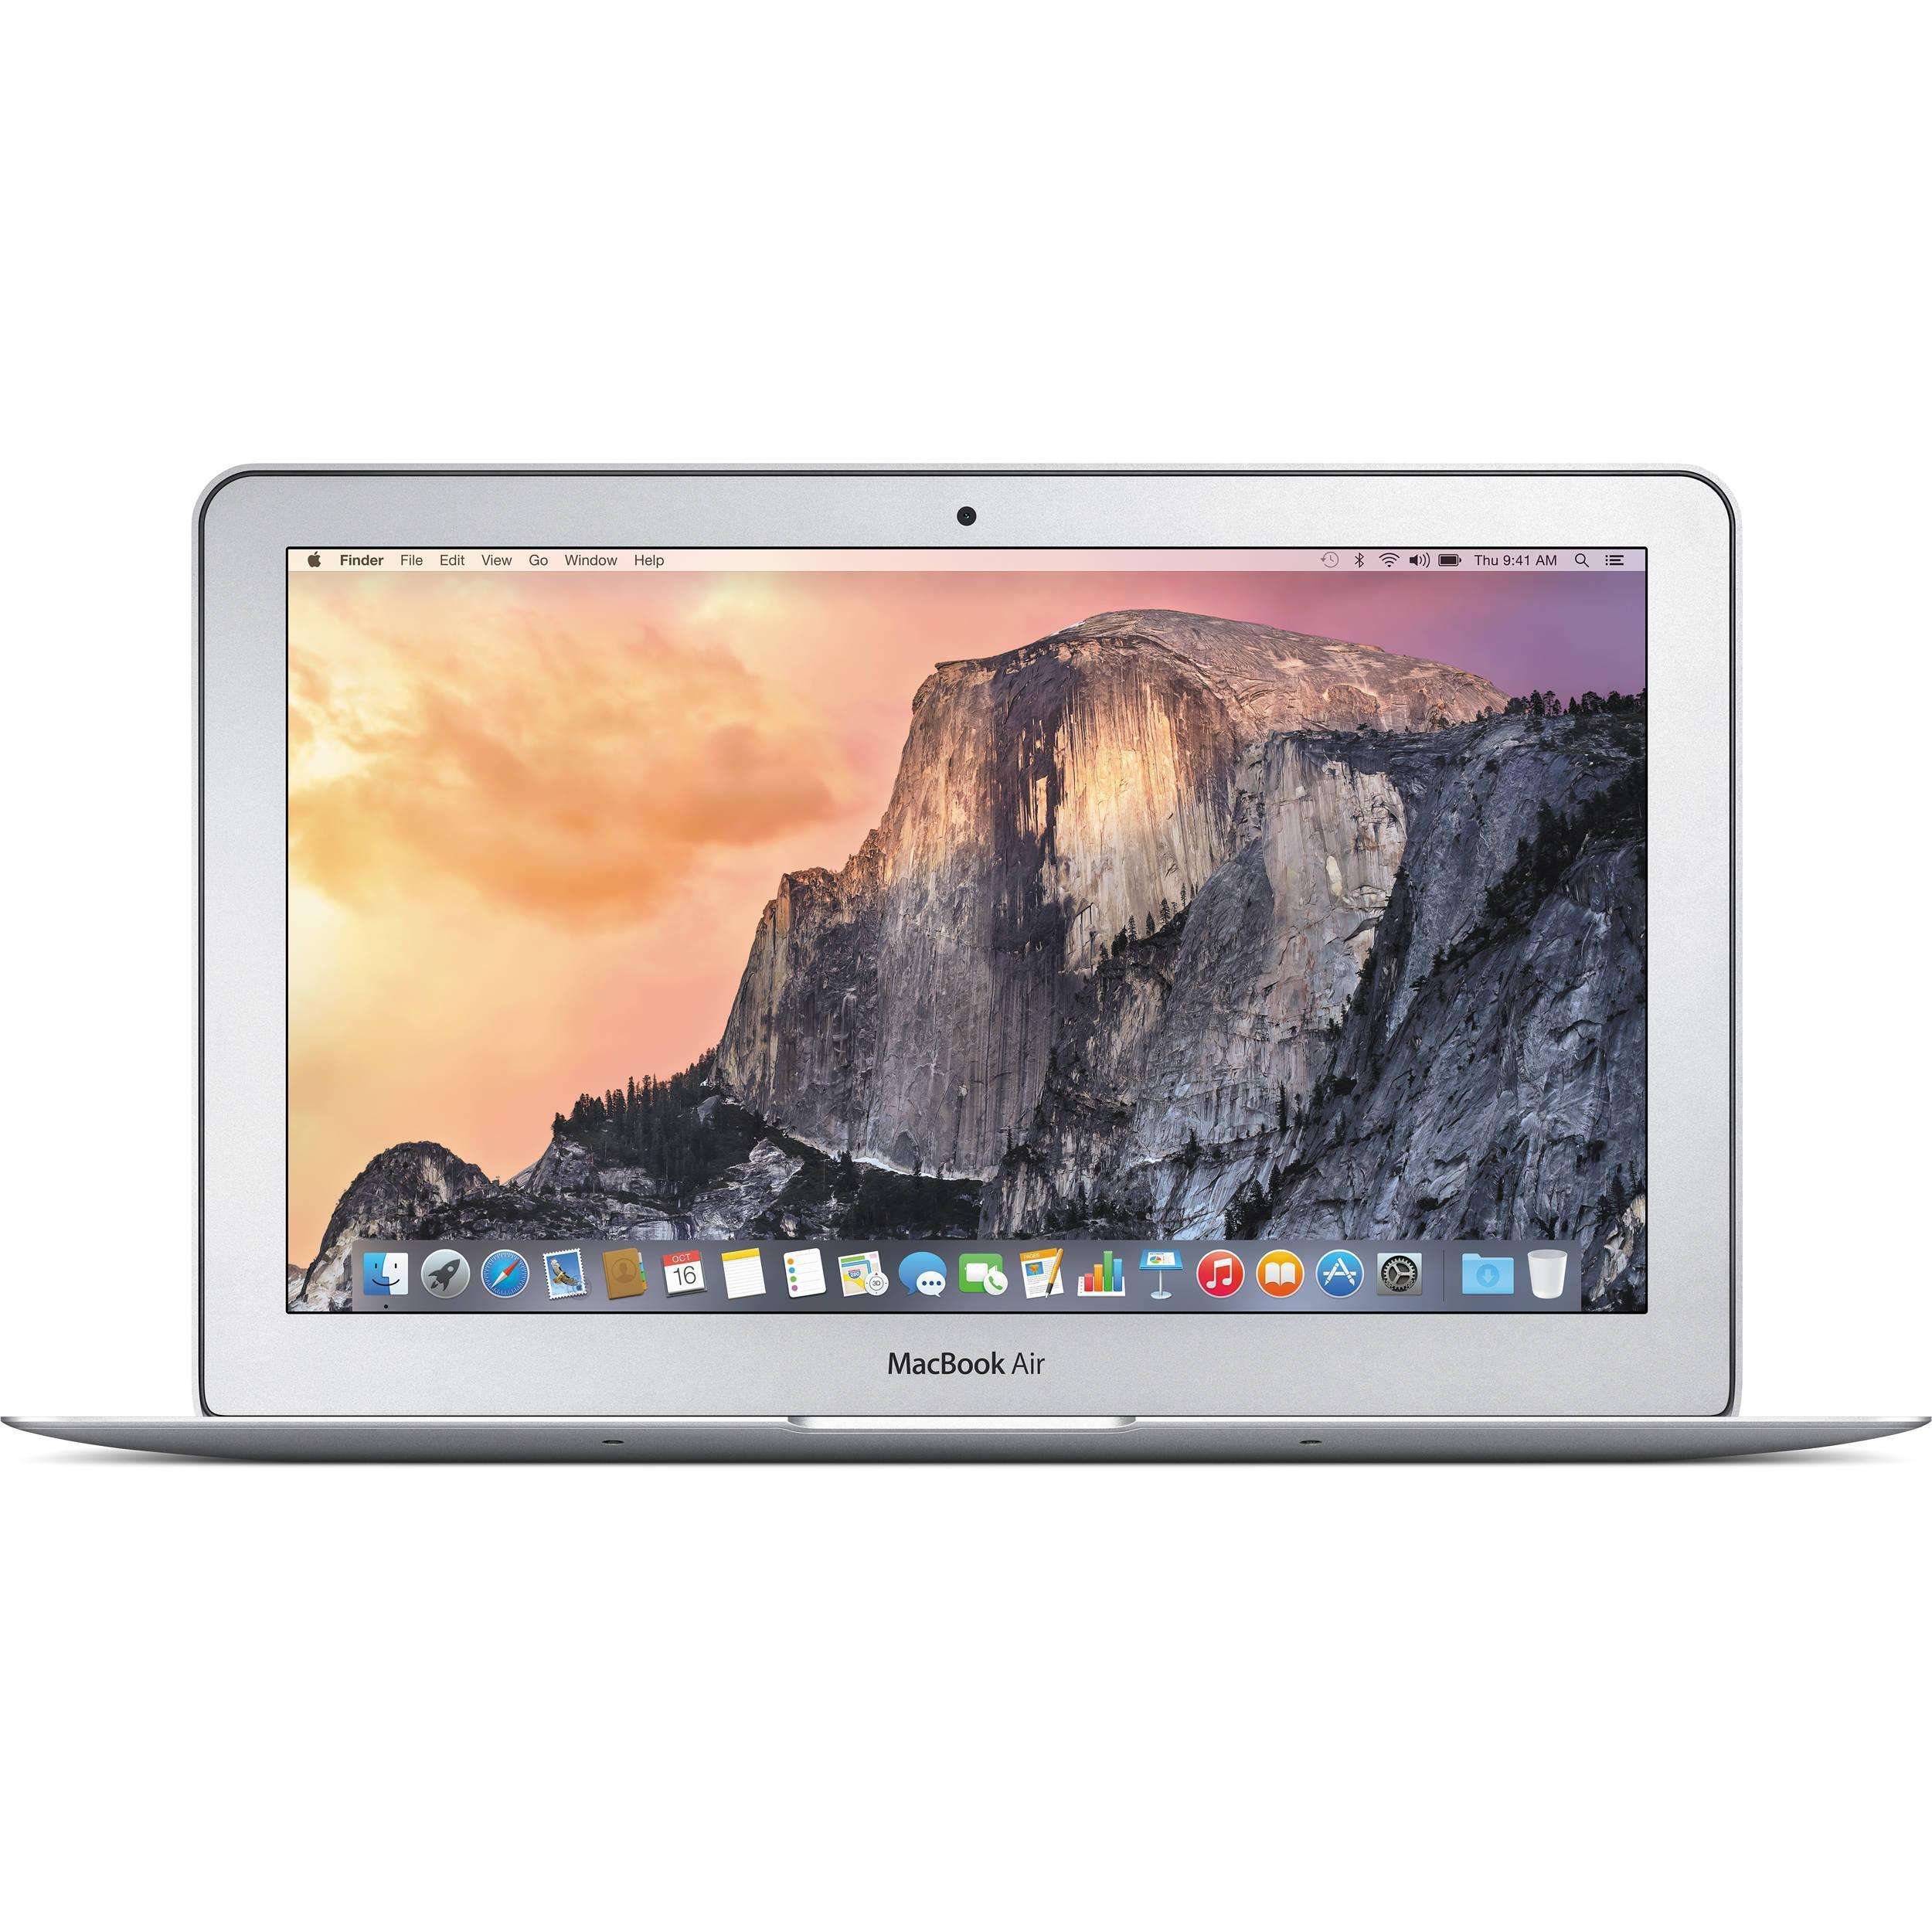 MacBook Air 11.6-inch (2014) - Core i5 - 4GB - SSD 128 GB QWERTY - English (US)